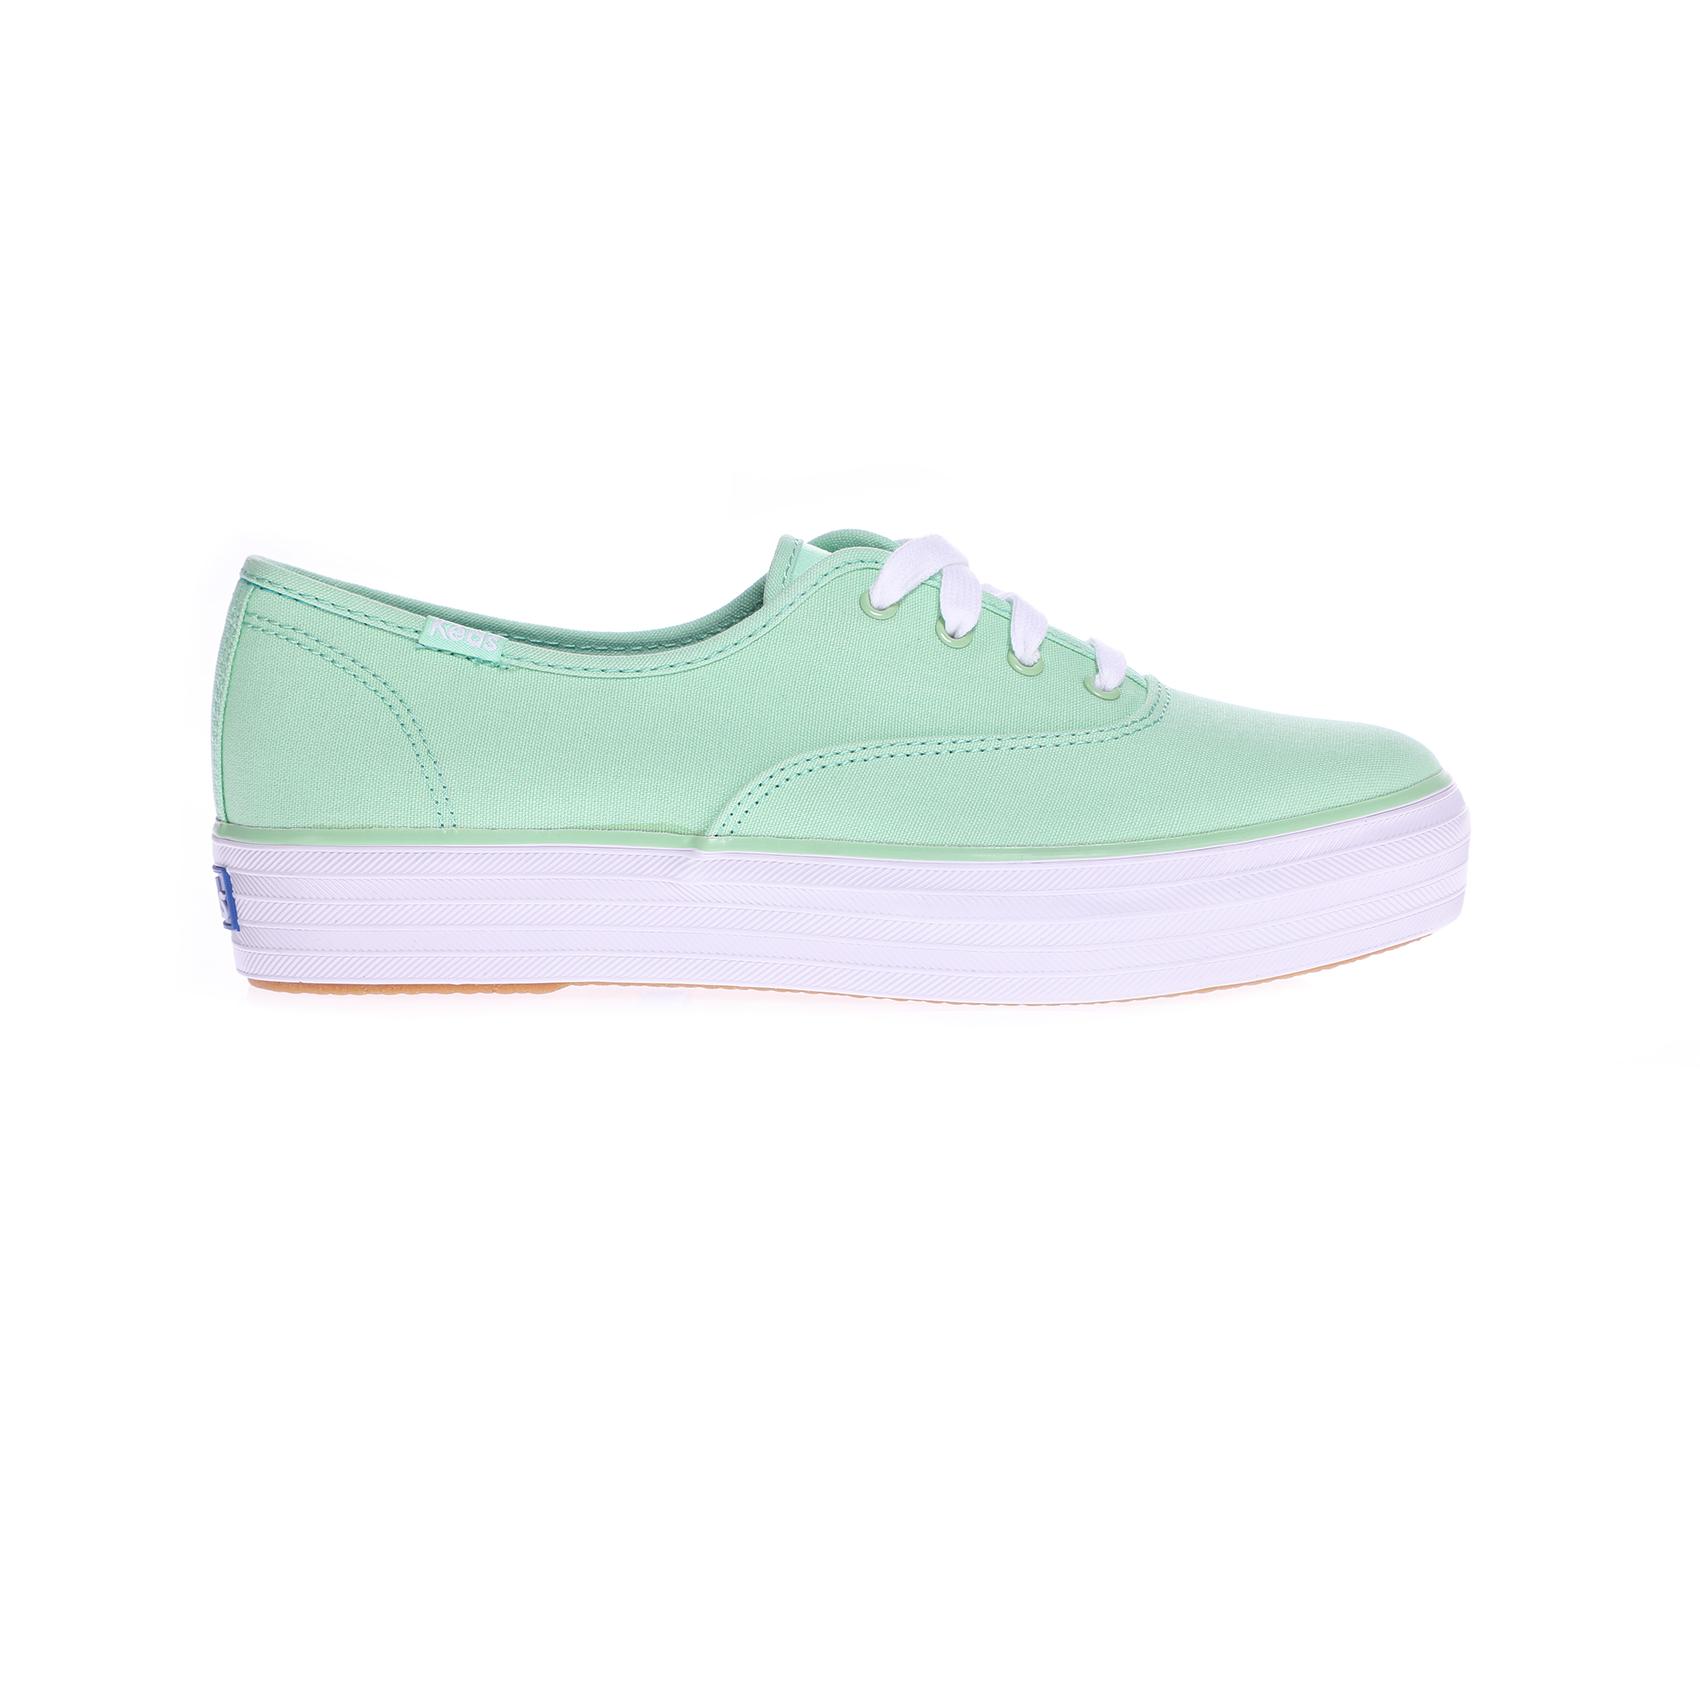 KEDS - Γυναικεία παπούτσια KEDS πράσινα γυναικεία παπούτσια sneakers